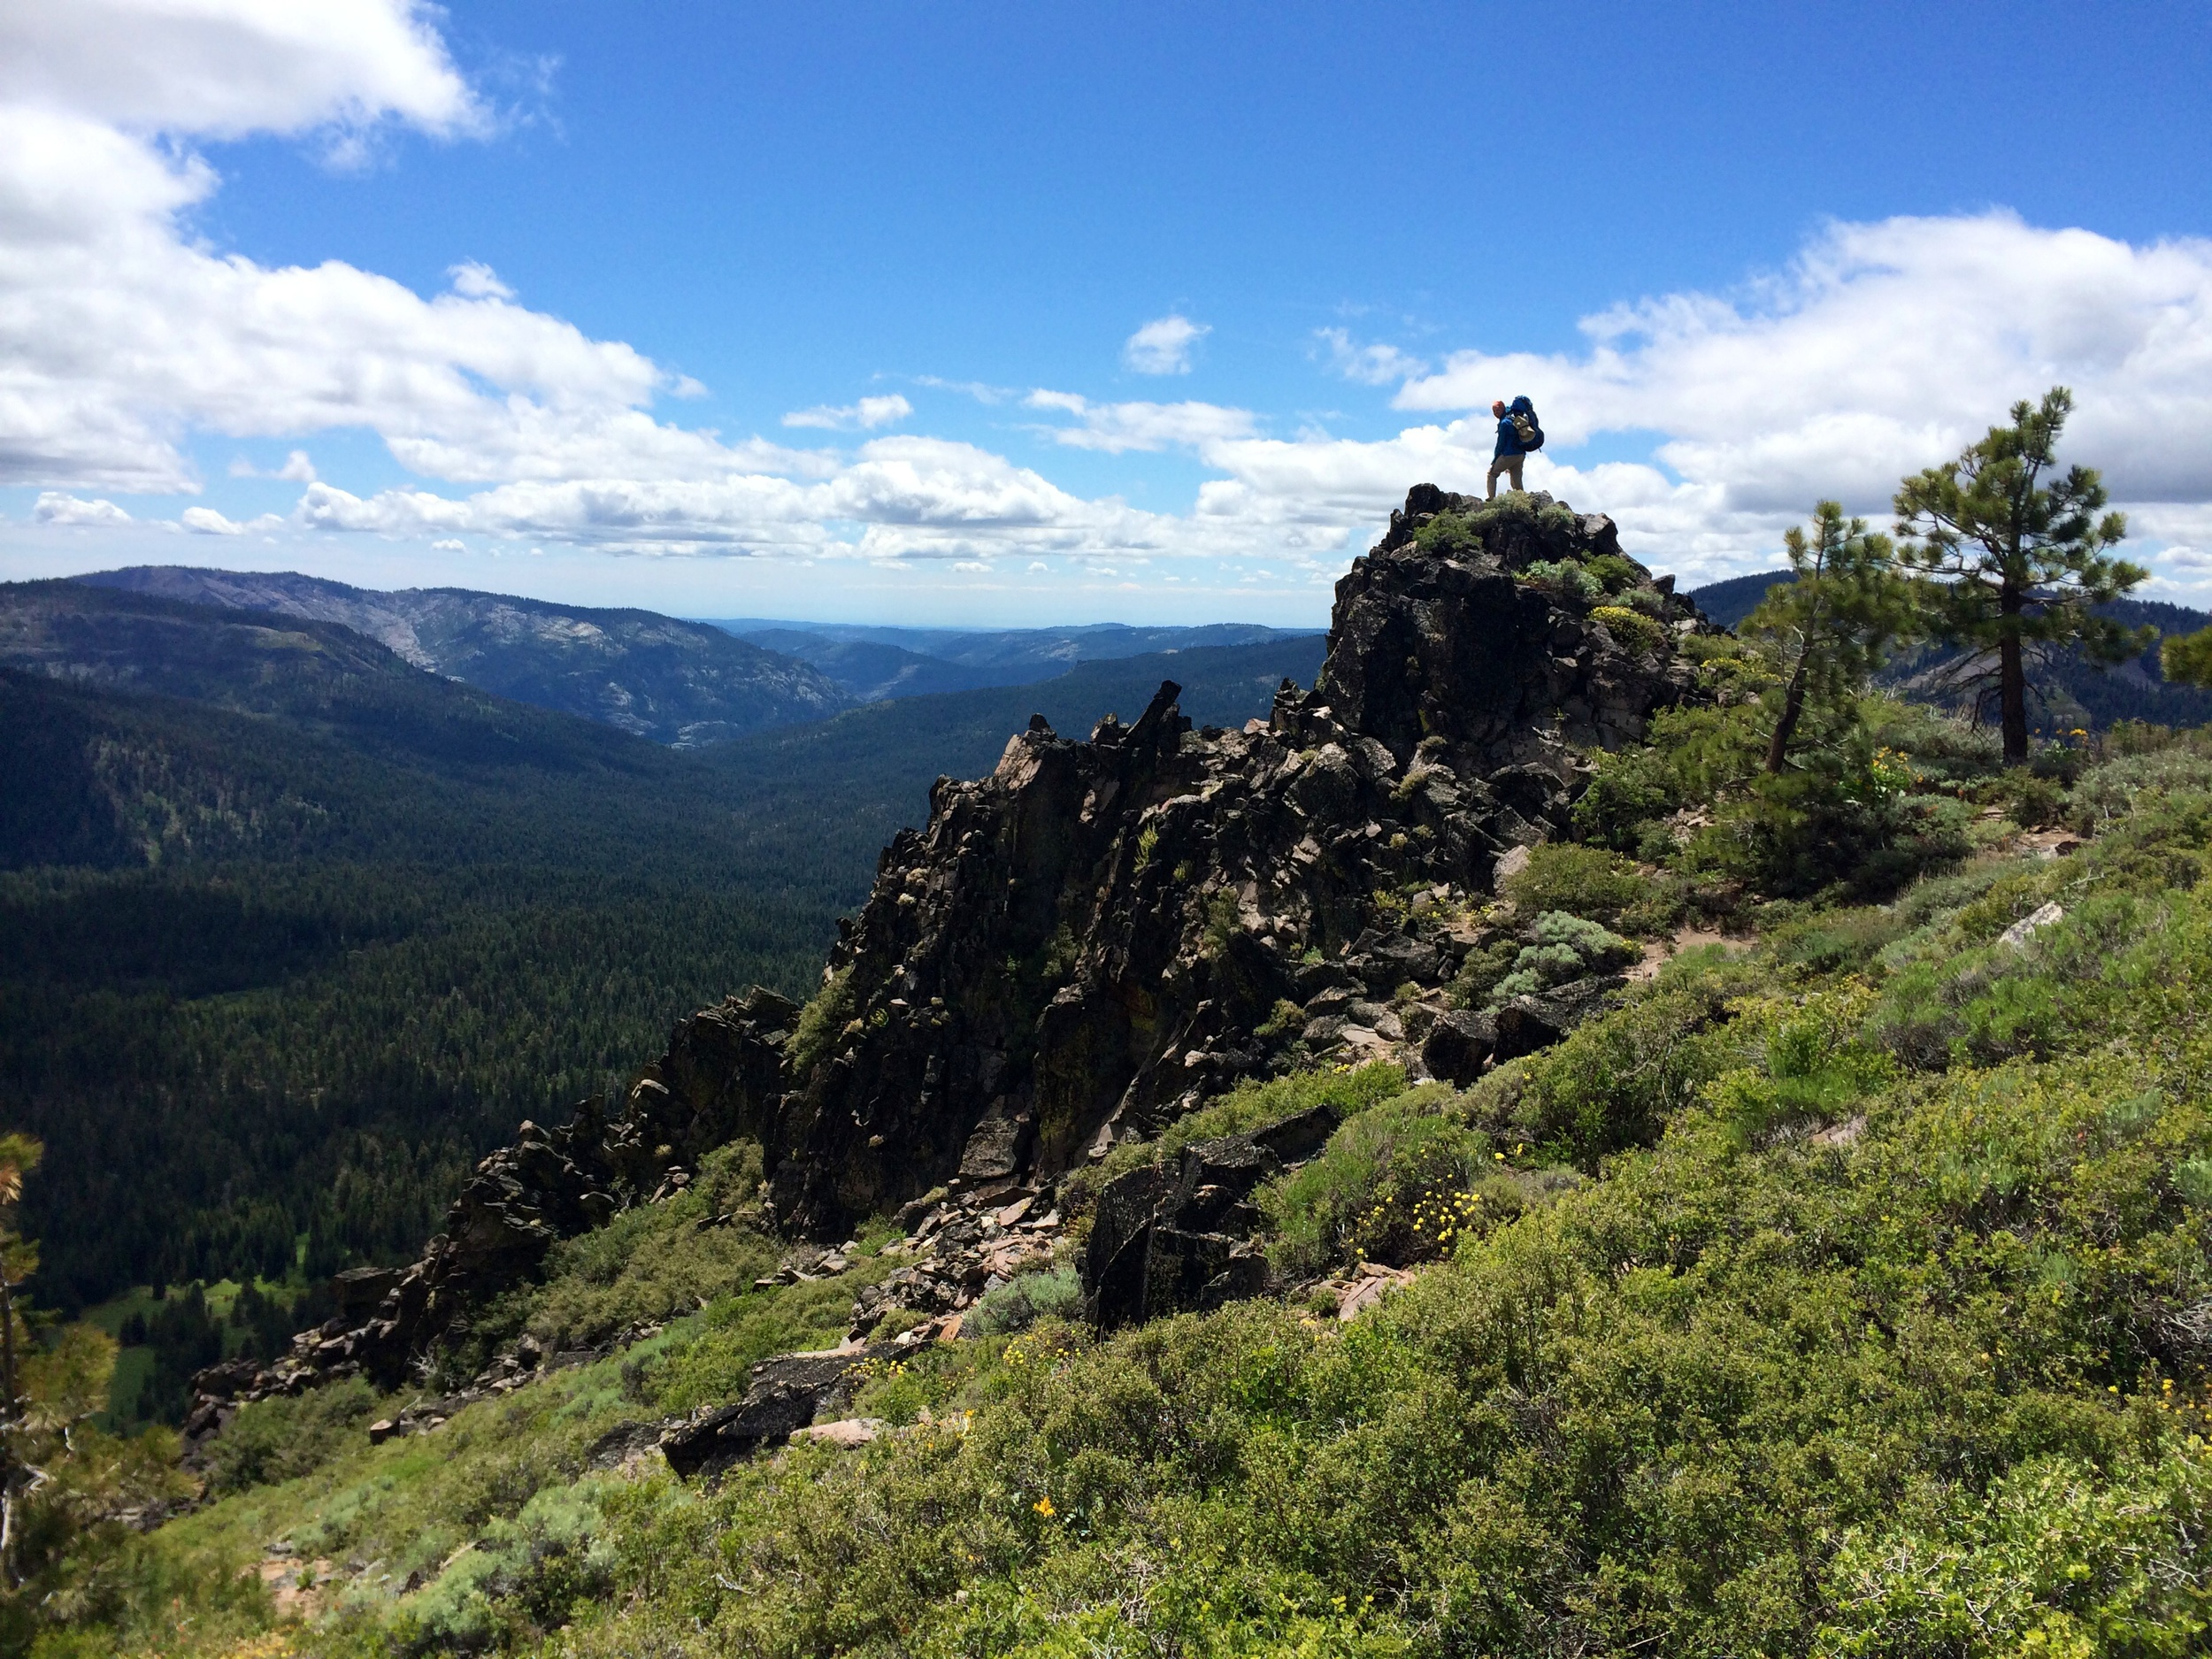 Joanna being brave on volcanic rocks